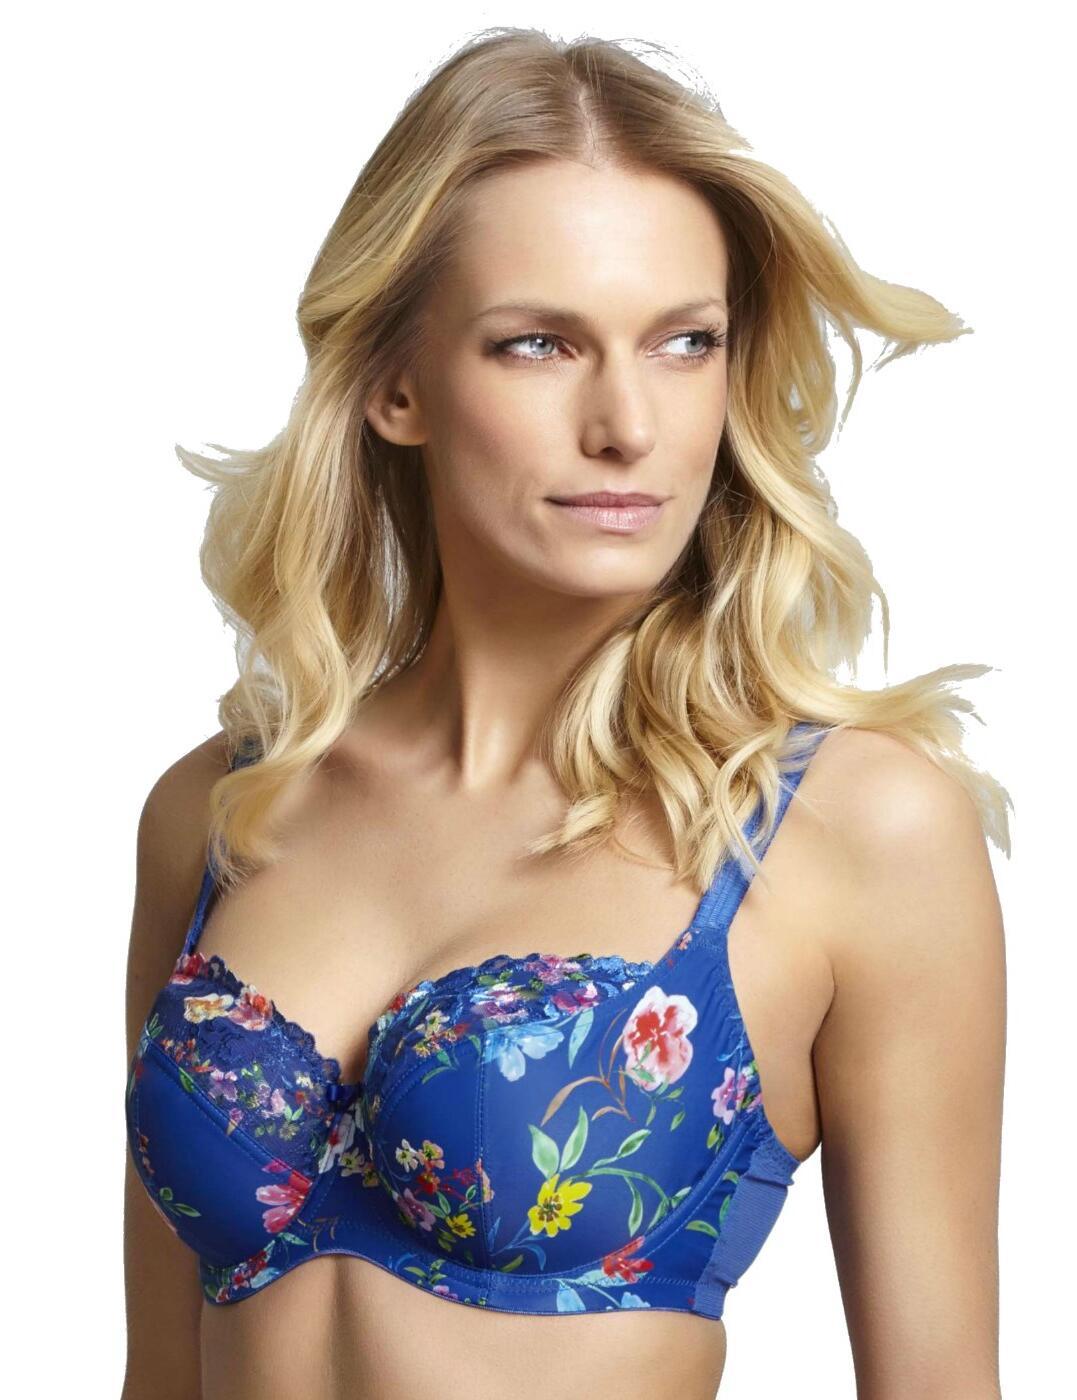 9261 Panache Thea Balcony Bra - 9261 Cobalt/Floral